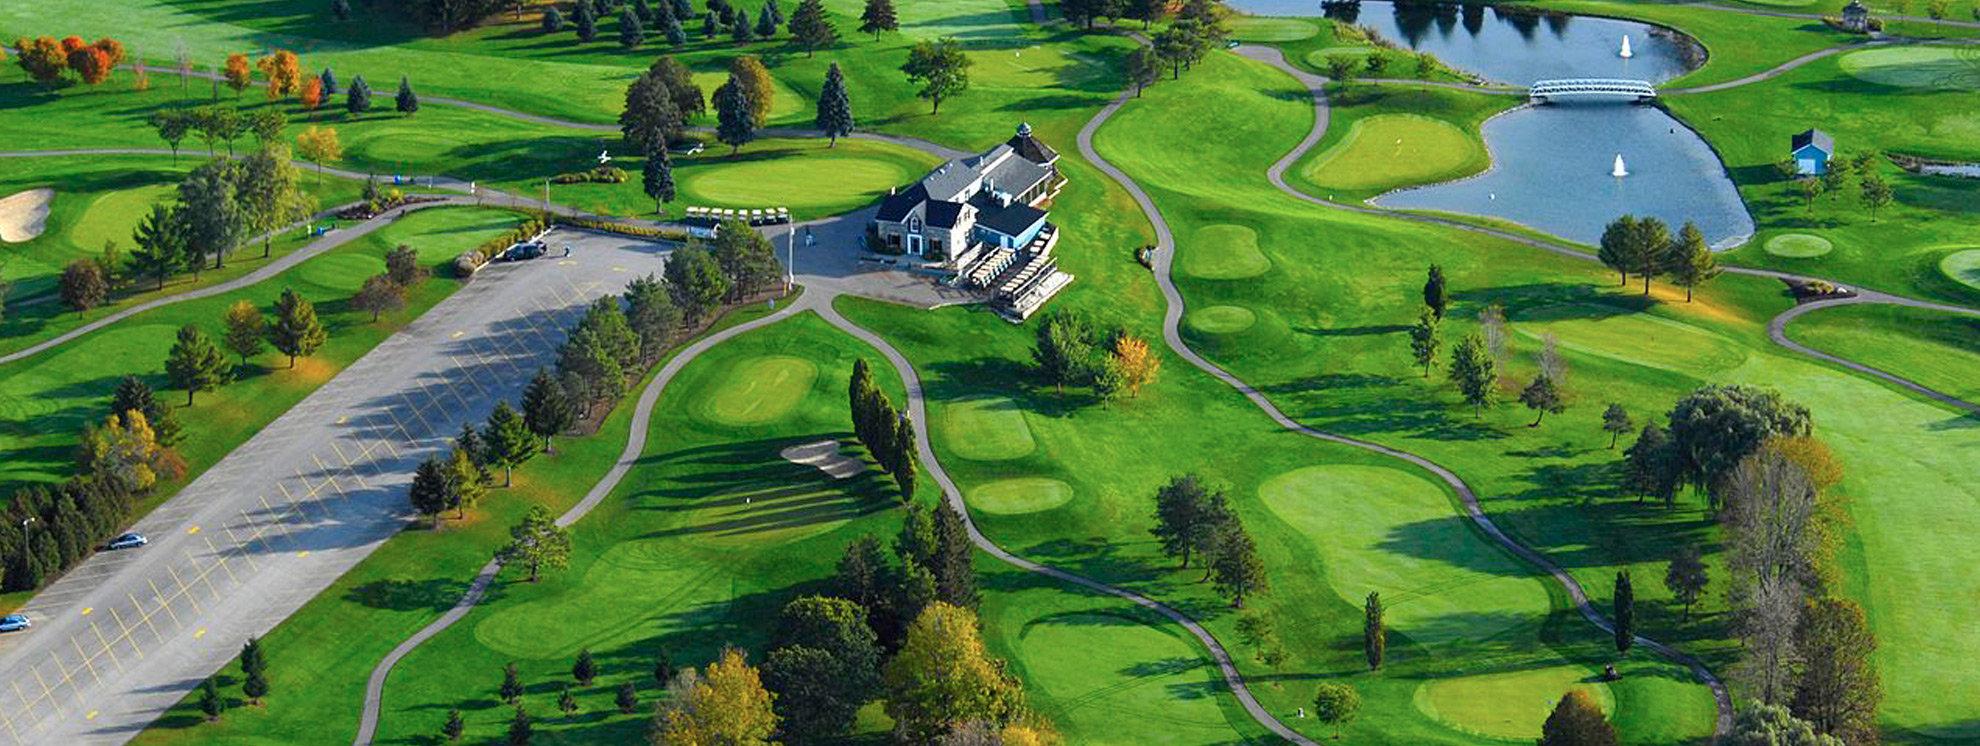 09-Golf-Course-Design-1.jpg